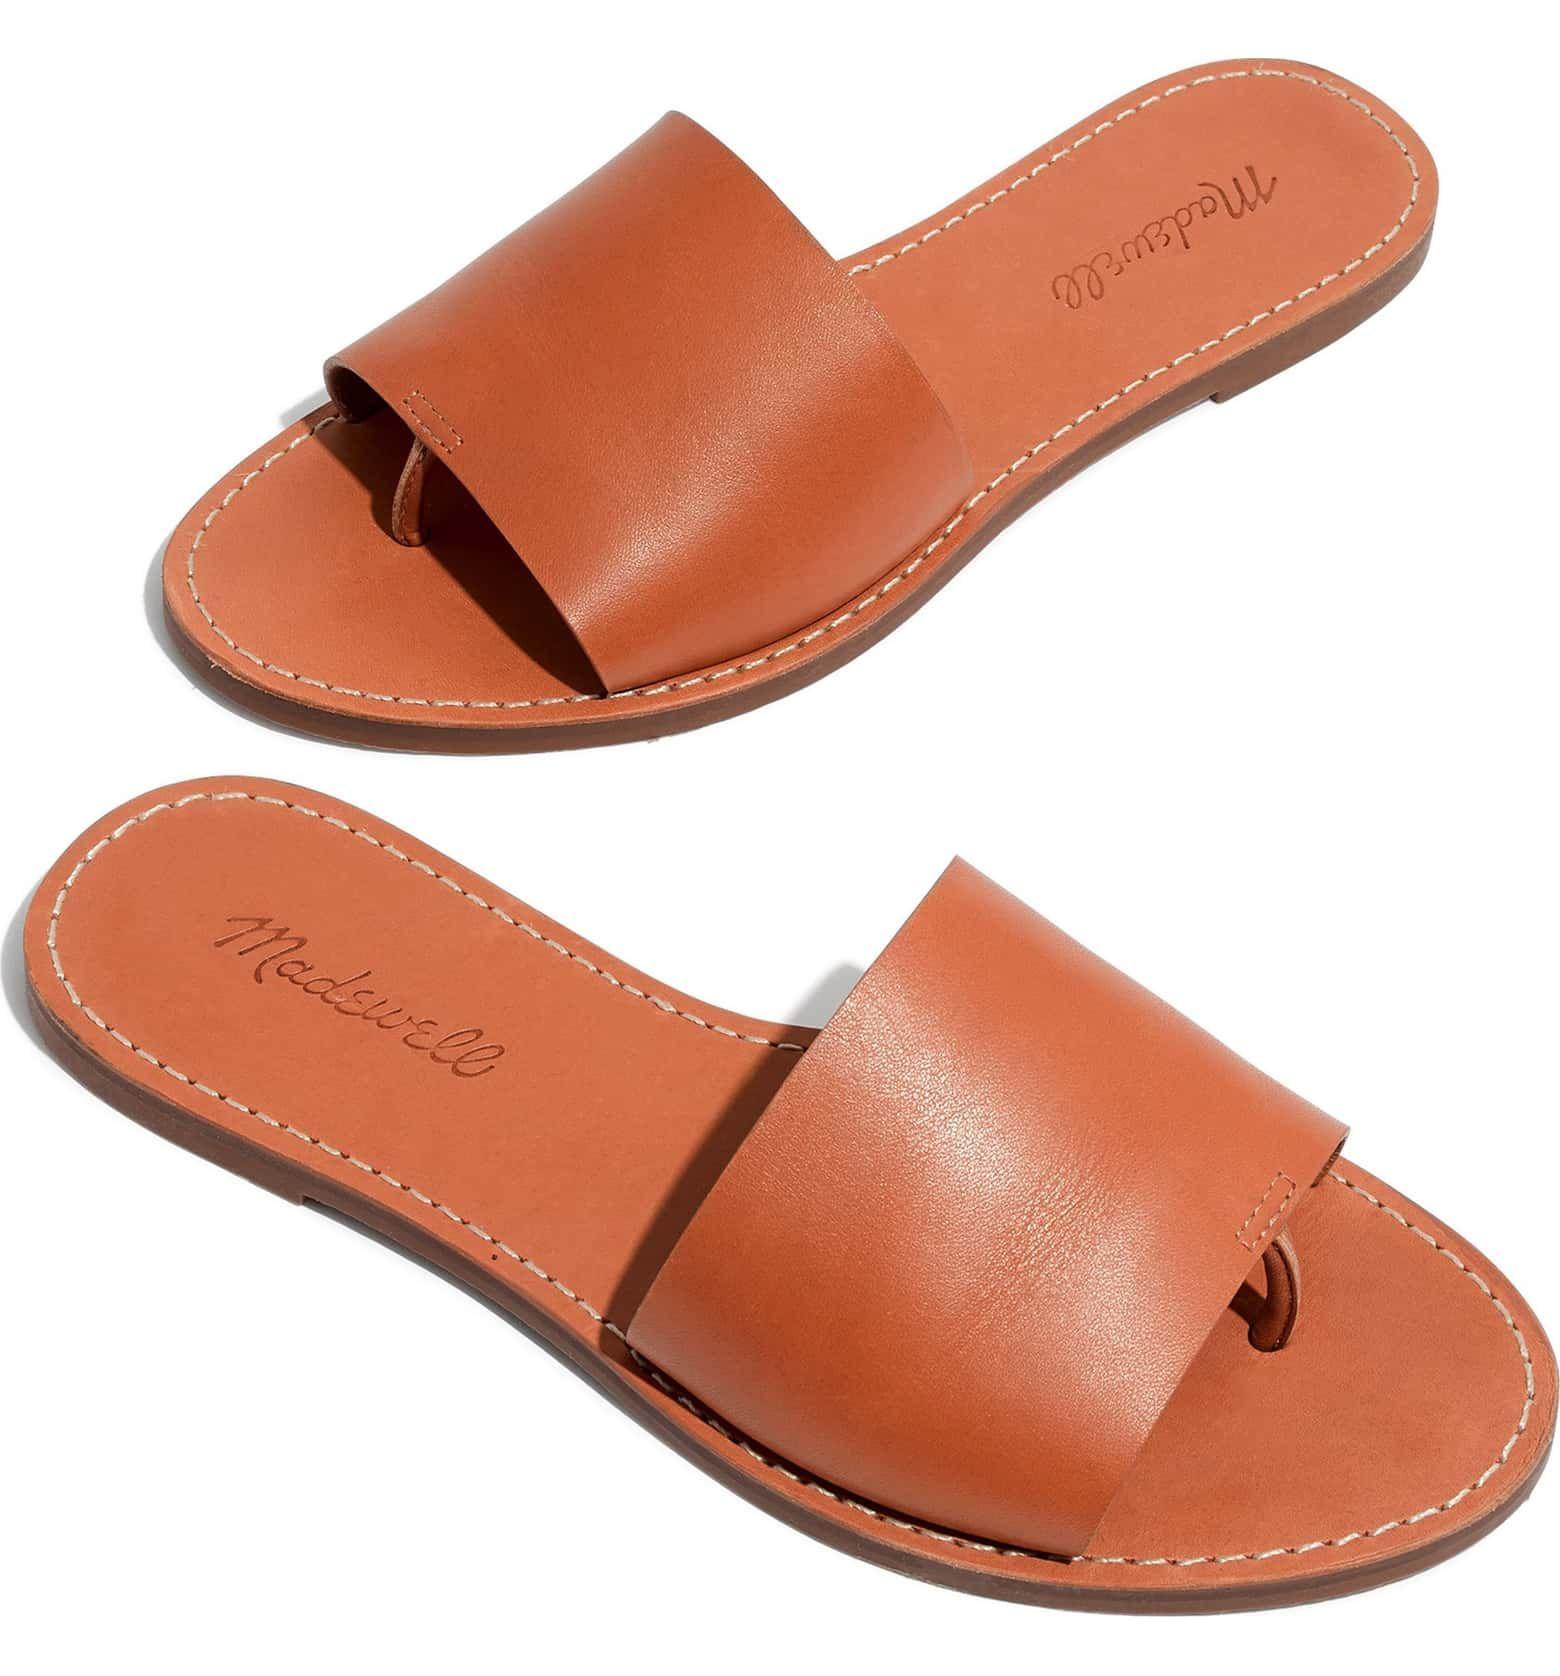 Pin on Fashion - Shoes